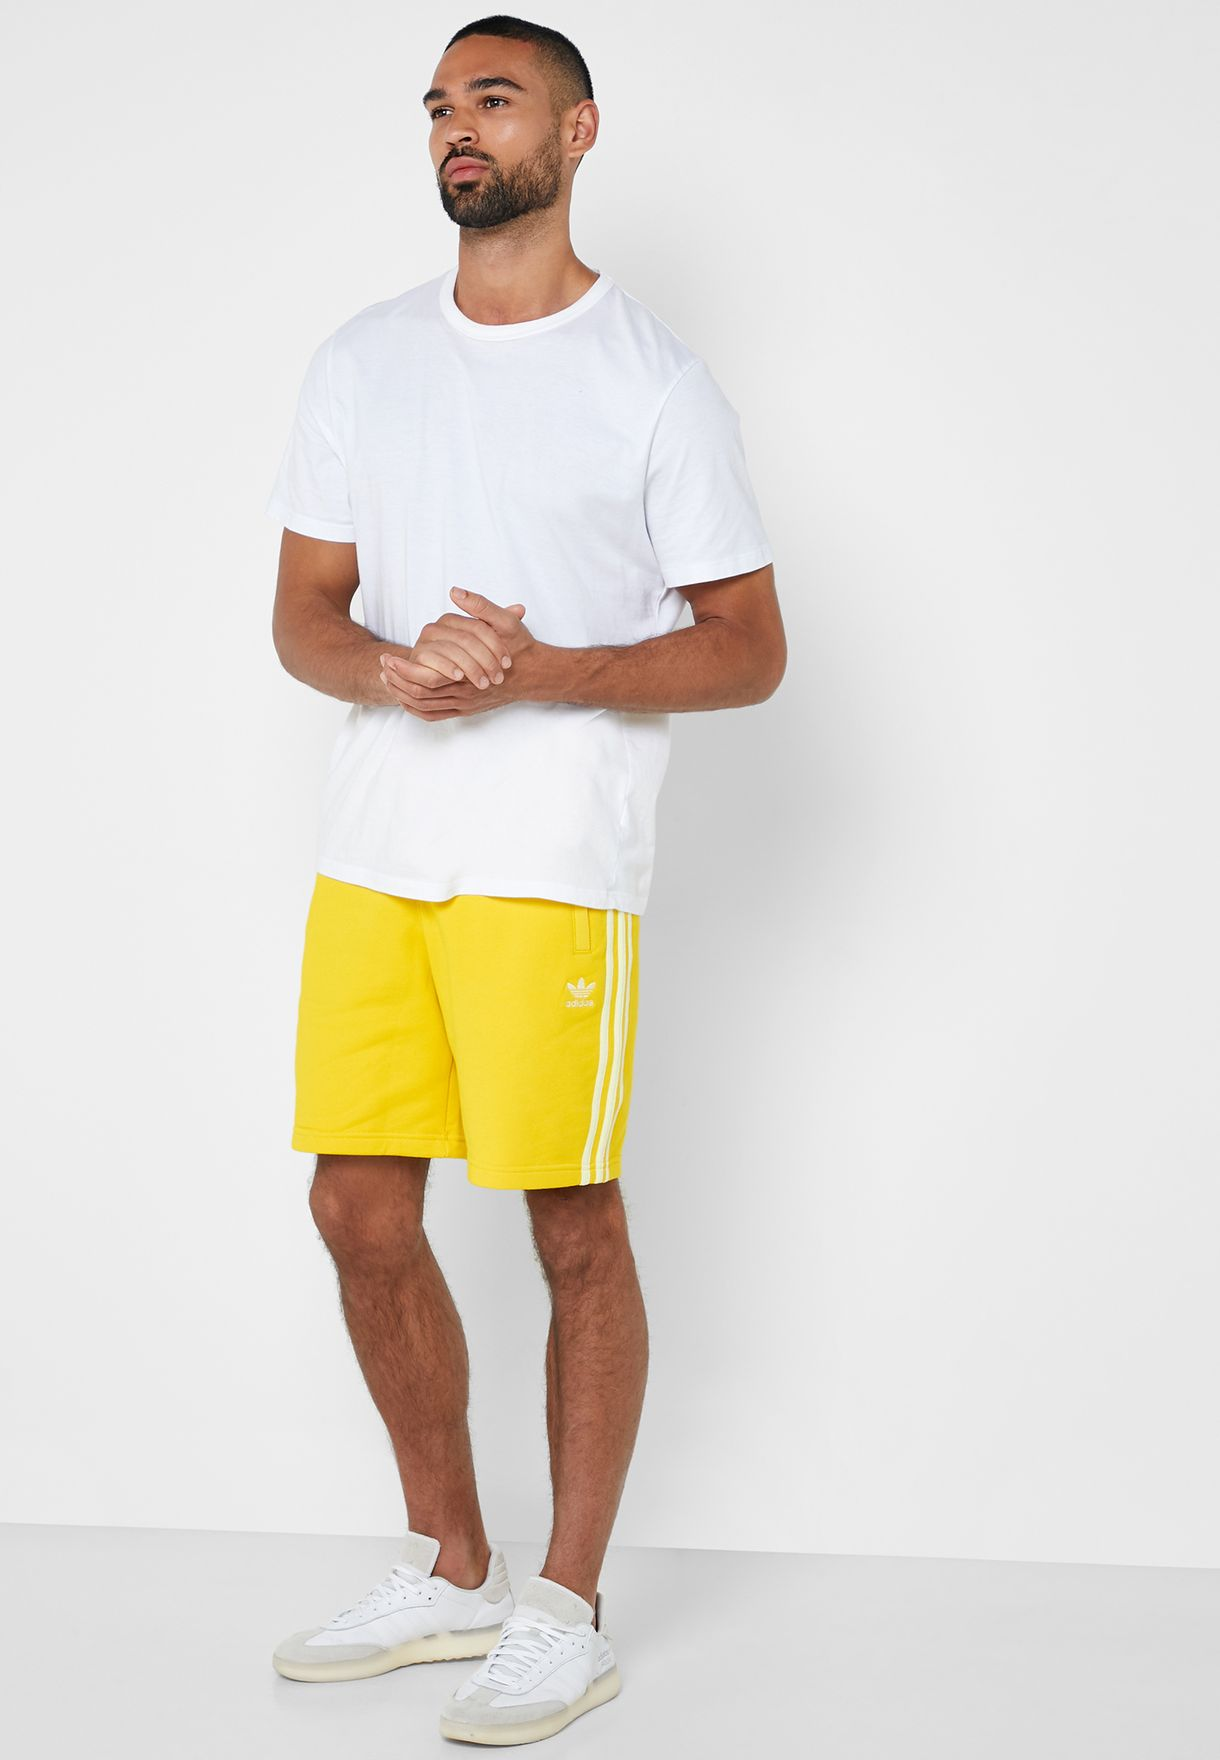 adidas 3 stripes shorts men